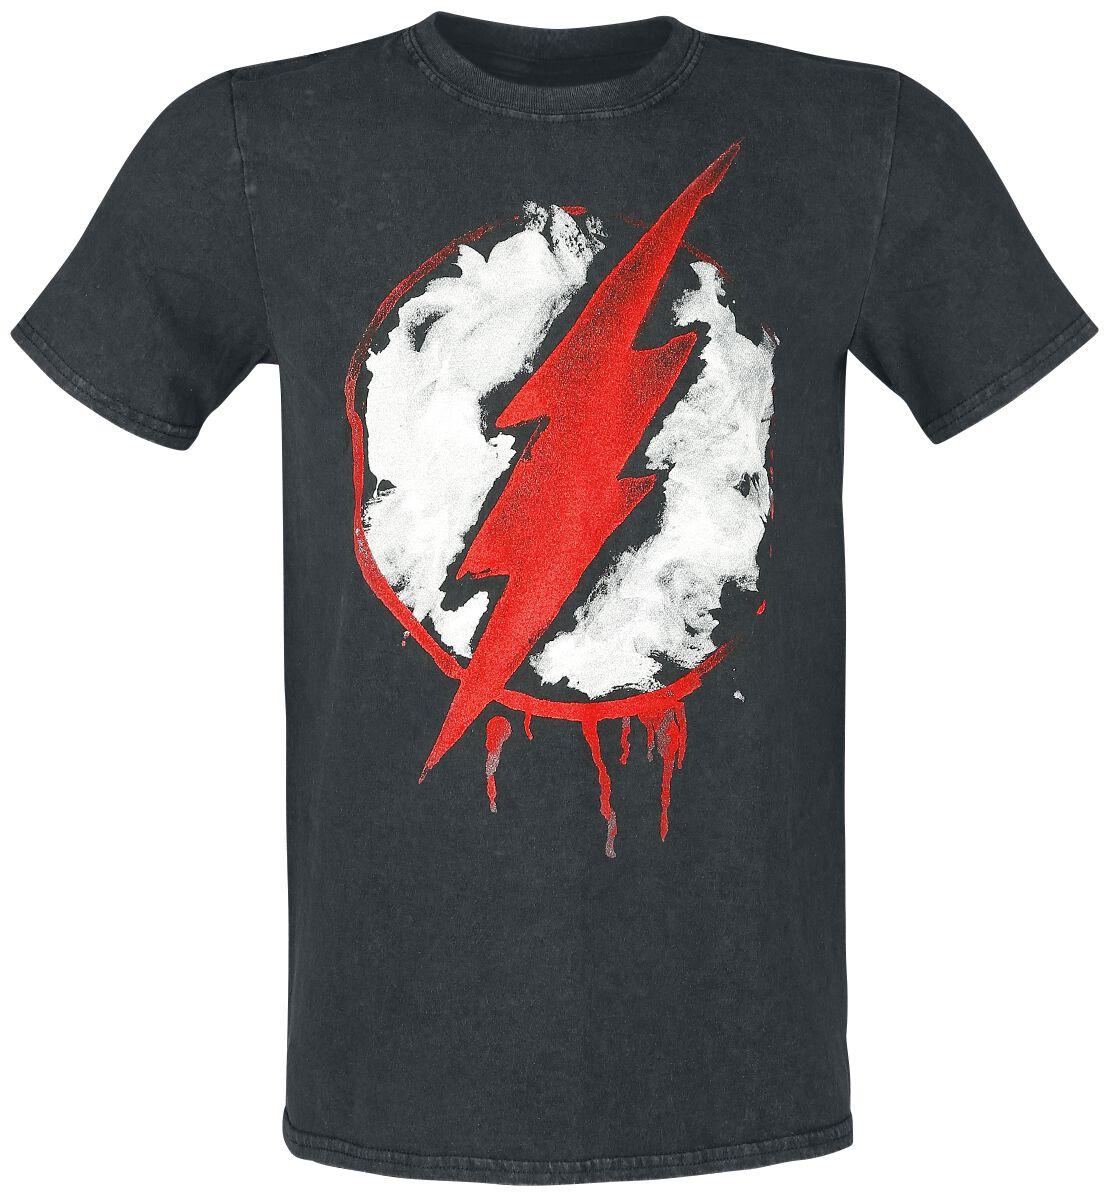 Merch dla Fanów - Koszulki - T-Shirt The Flash Logo T-Shirt ciemnoszary (Anthracite) - 361358